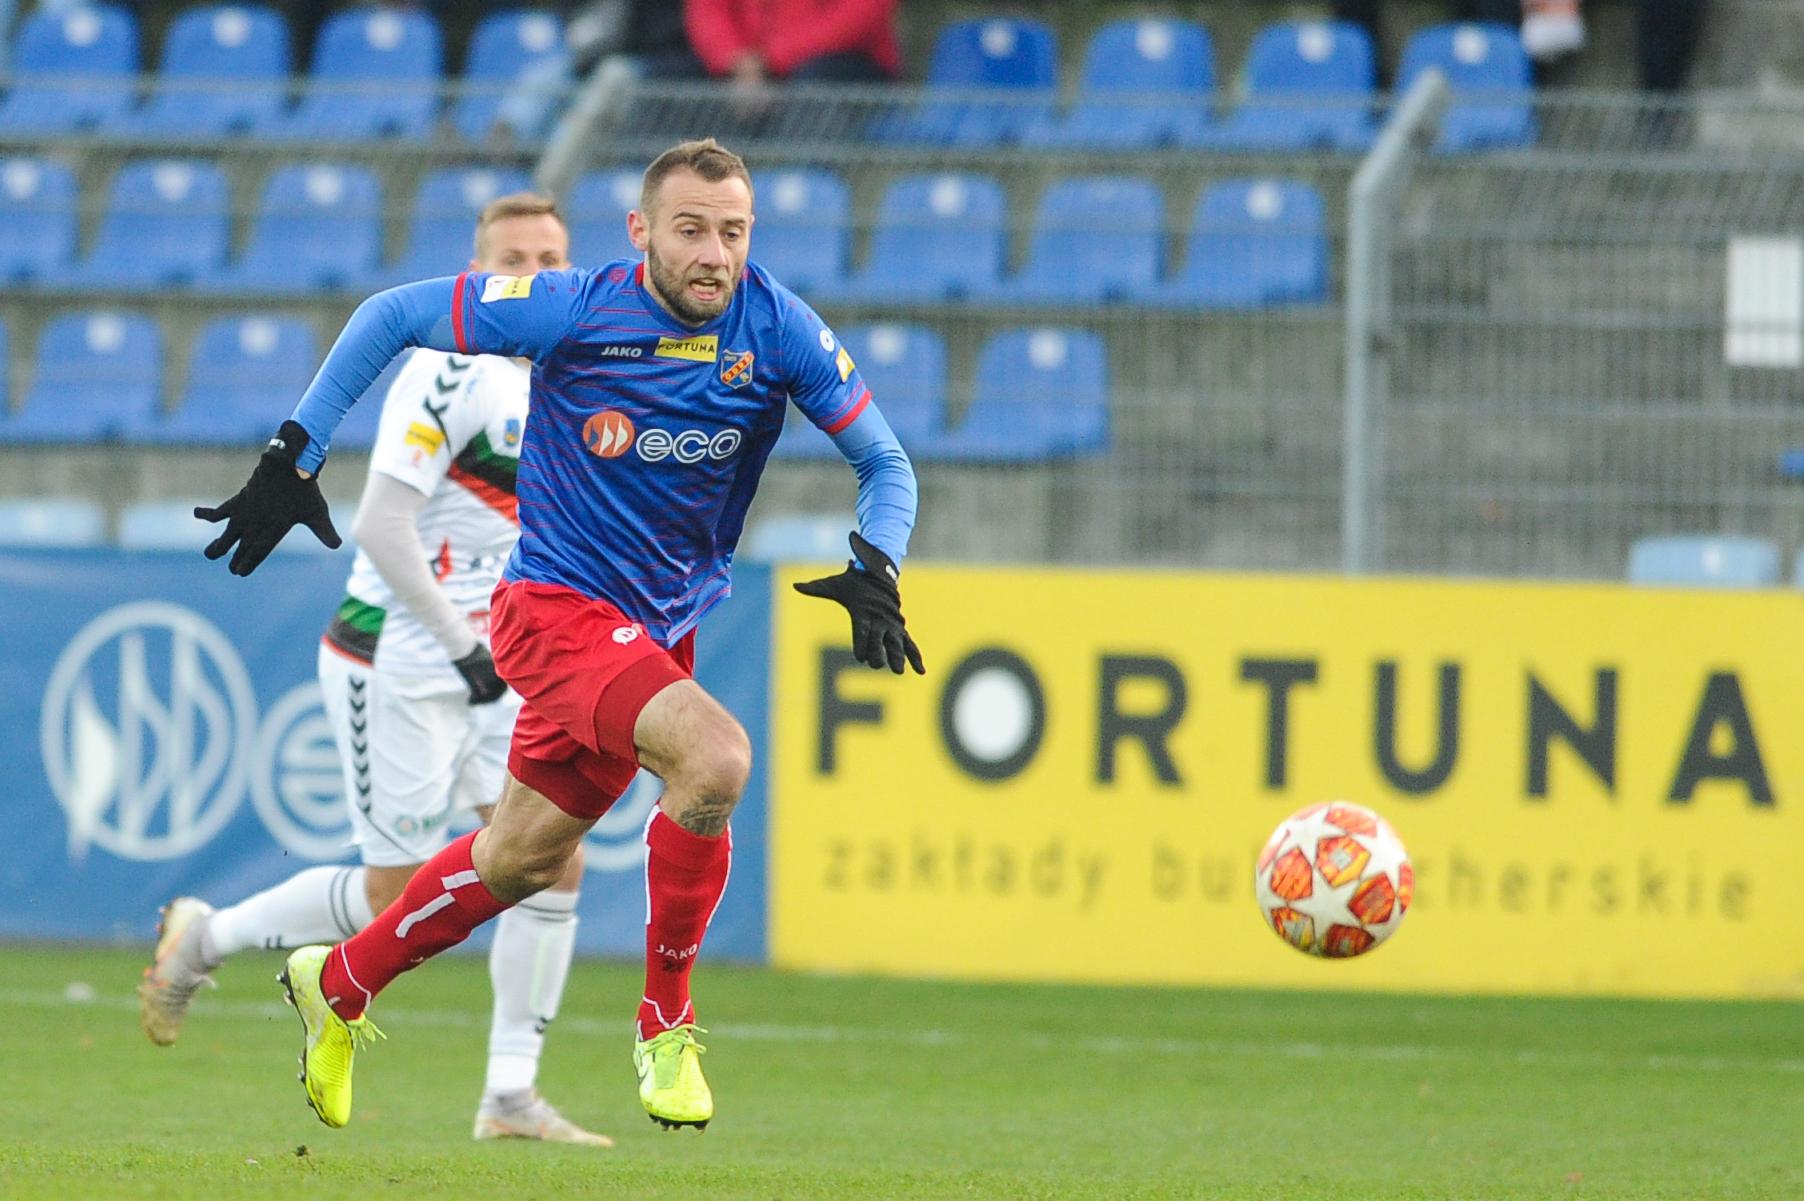 Odra Opole – GKS Tychy 0:0